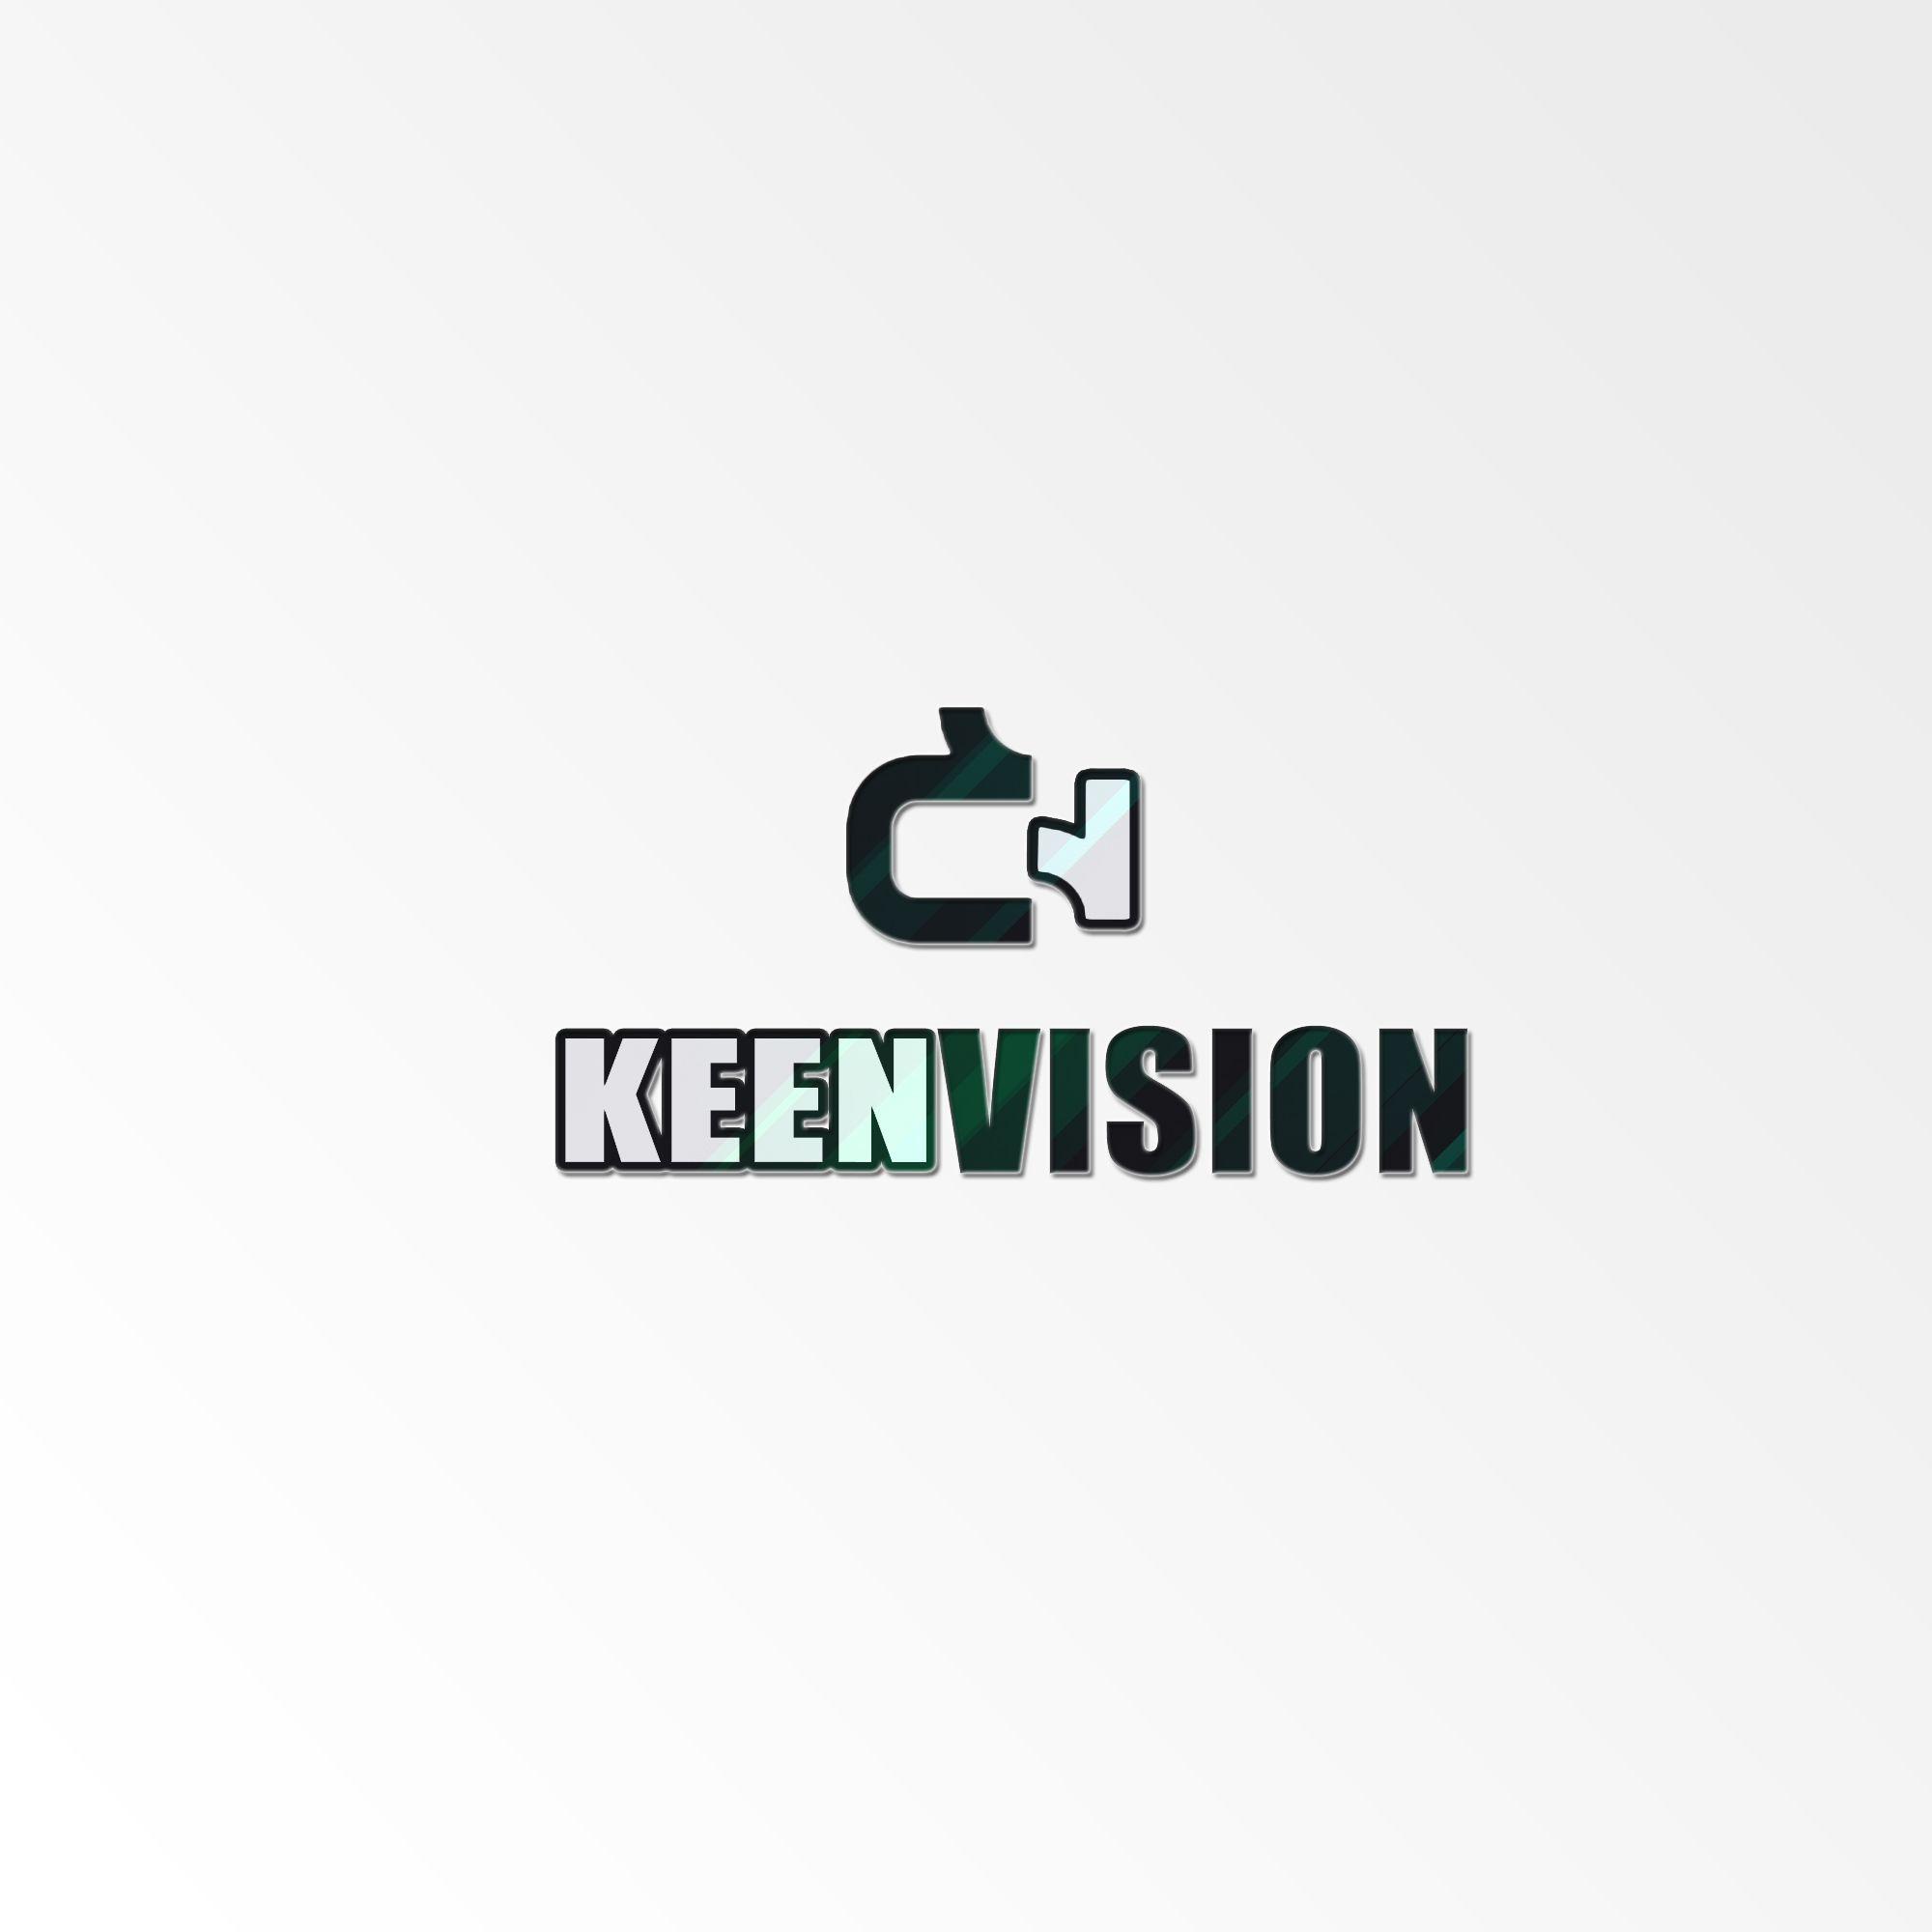 Логотип для KeenVision - дизайнер talitattooer